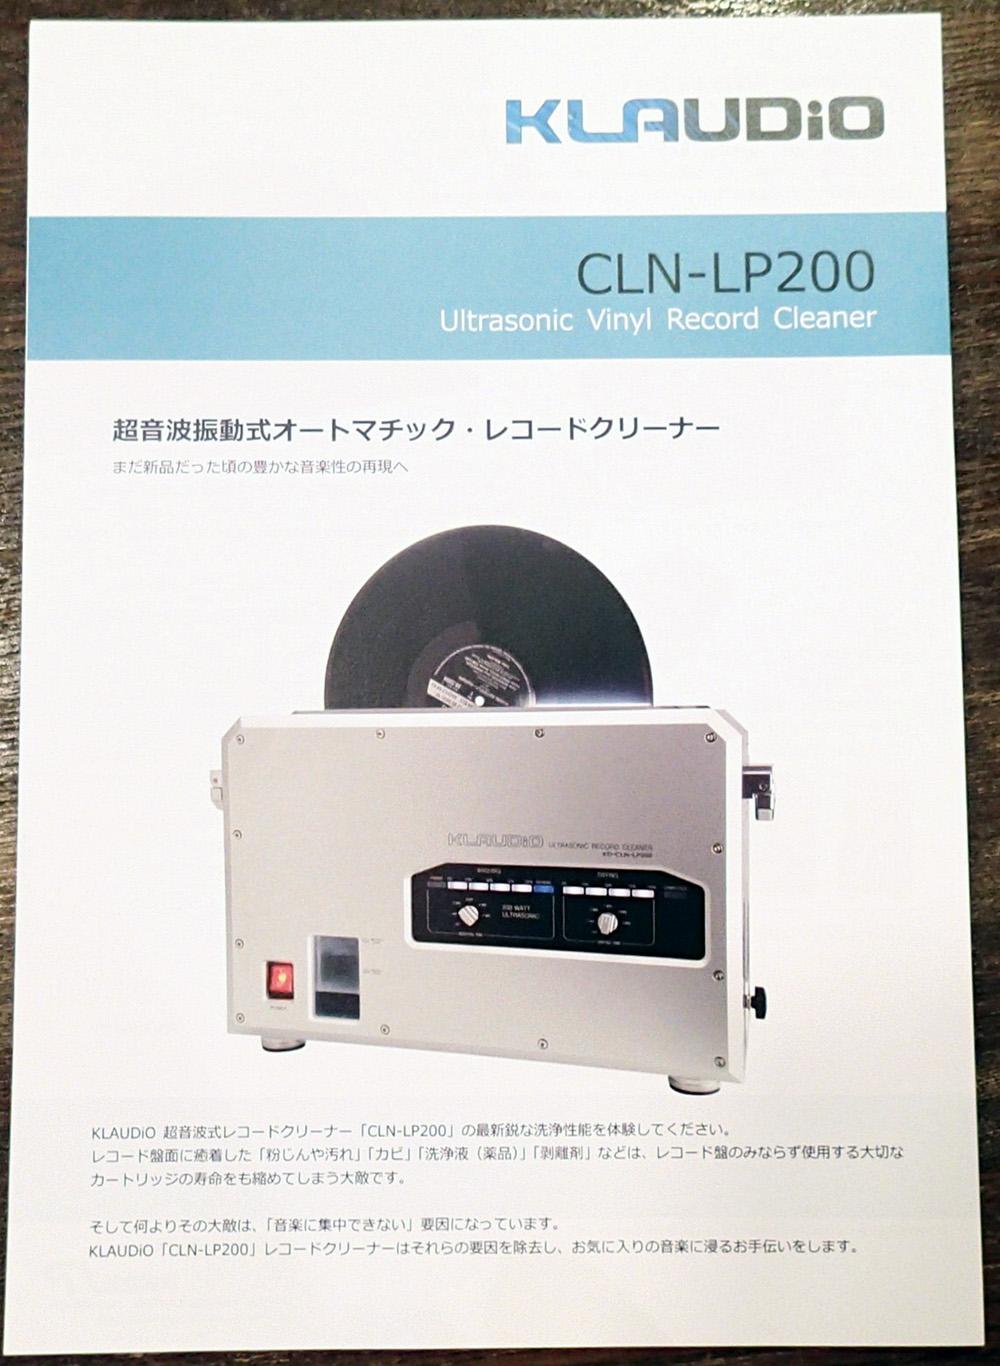 KLAUDiO CLN-LP200 超音波レコードクリーナー 店頭に入荷しました。_b0262449_21133981.jpg